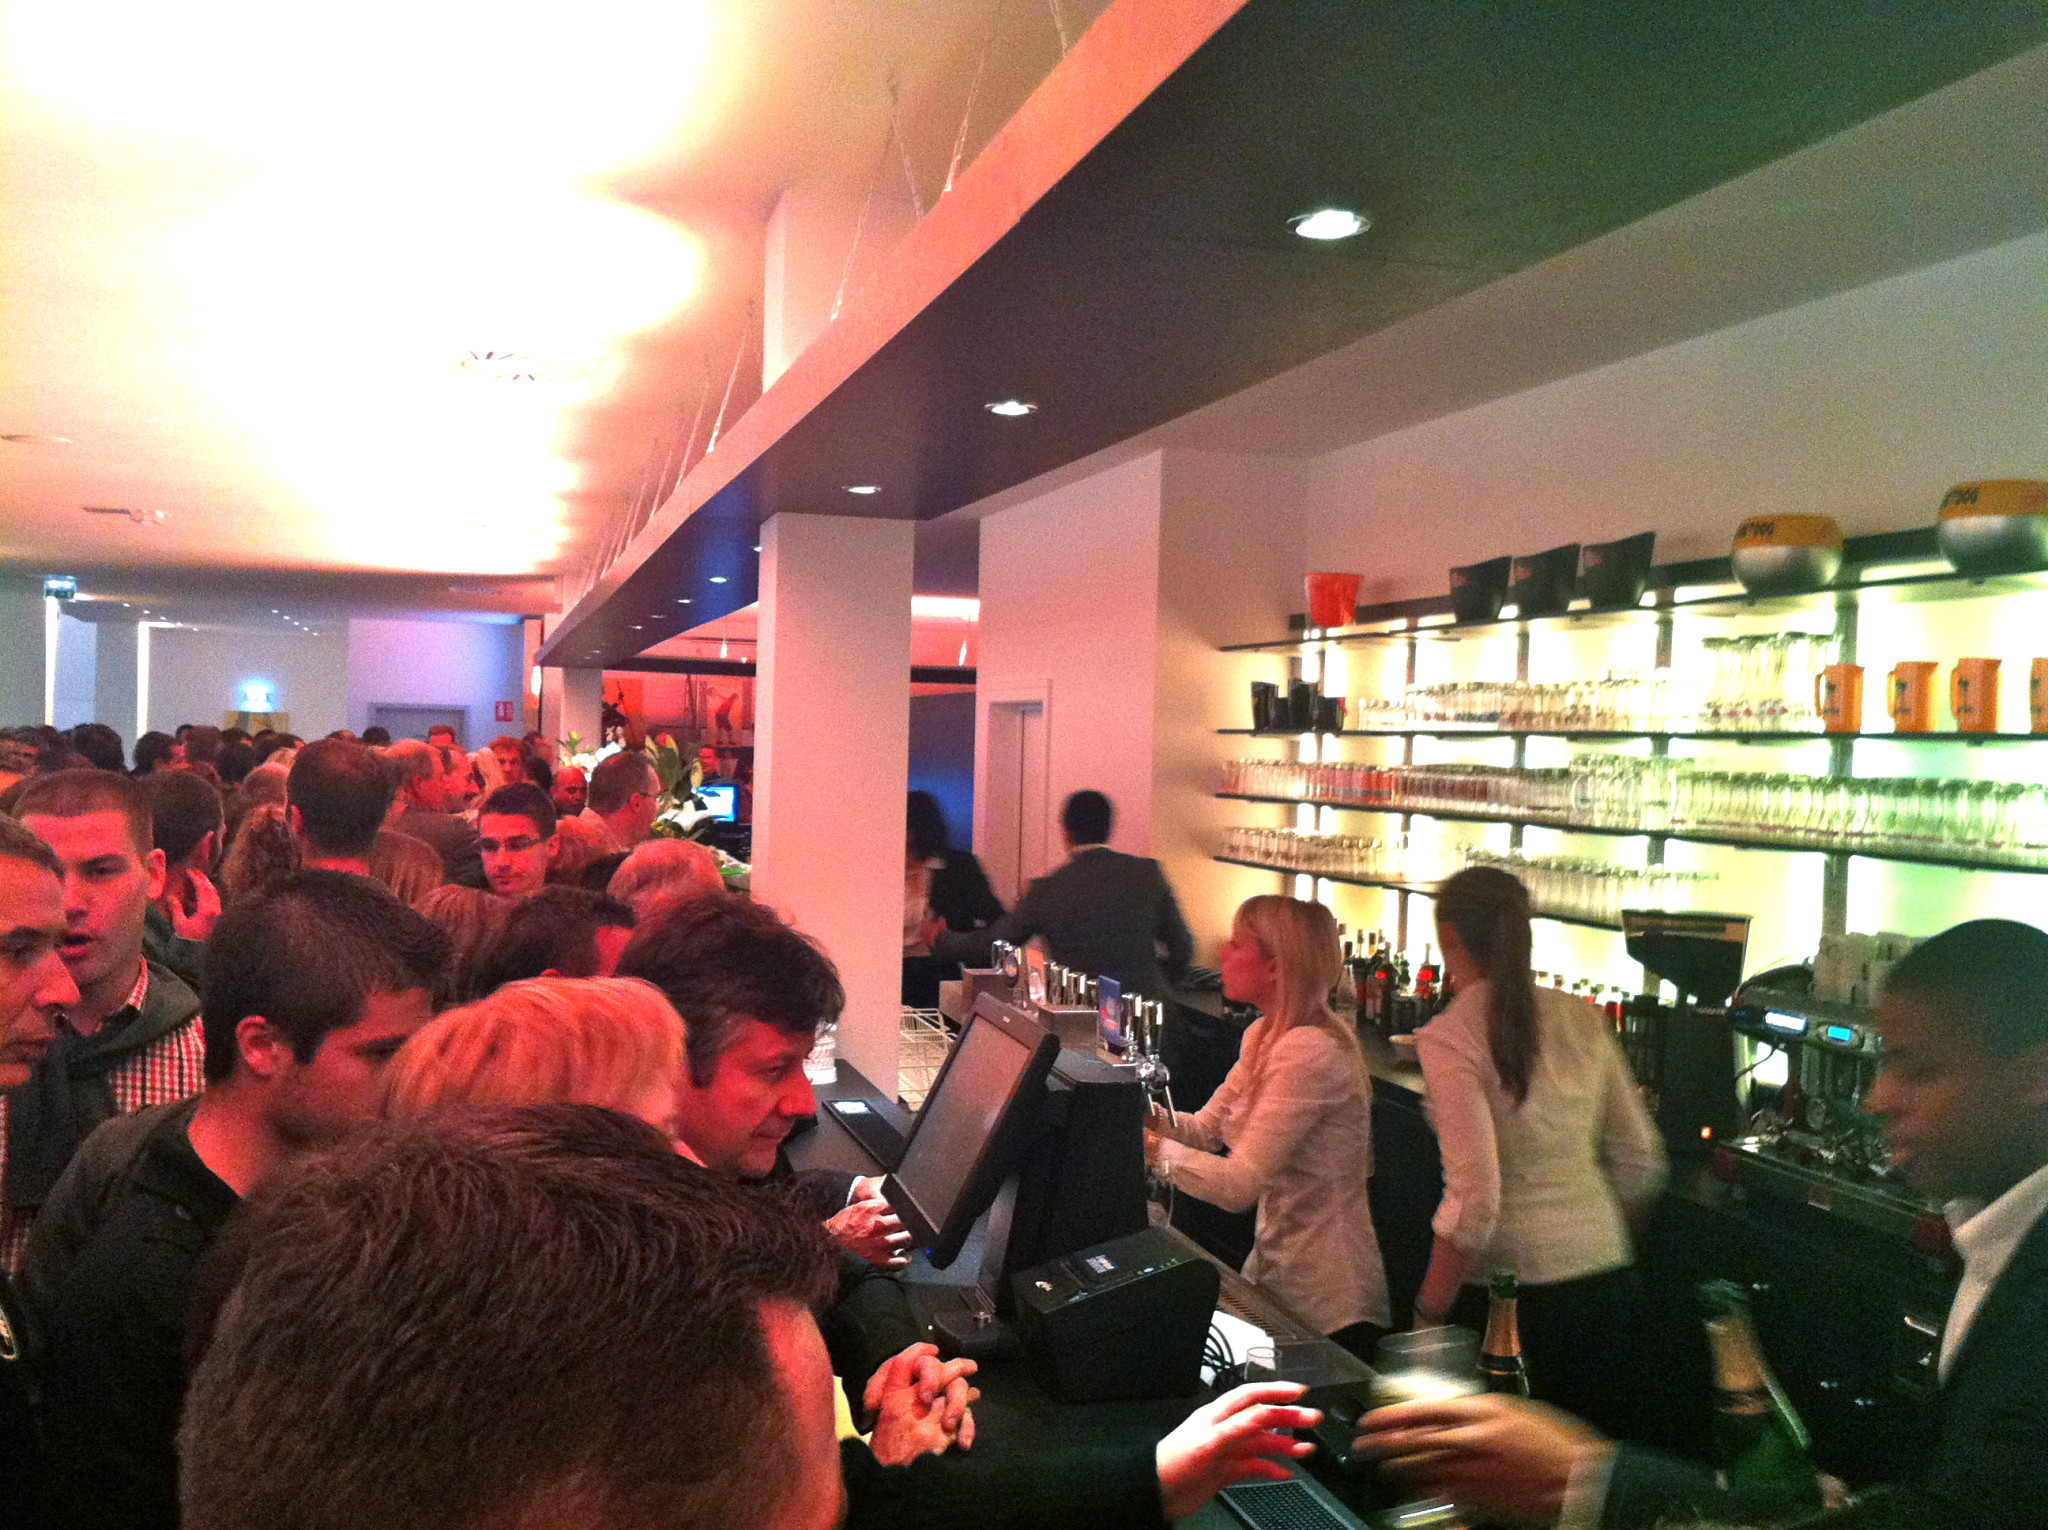 inauguration buffet bowling le trefle dorlisheim blog kapou. Black Bedroom Furniture Sets. Home Design Ideas